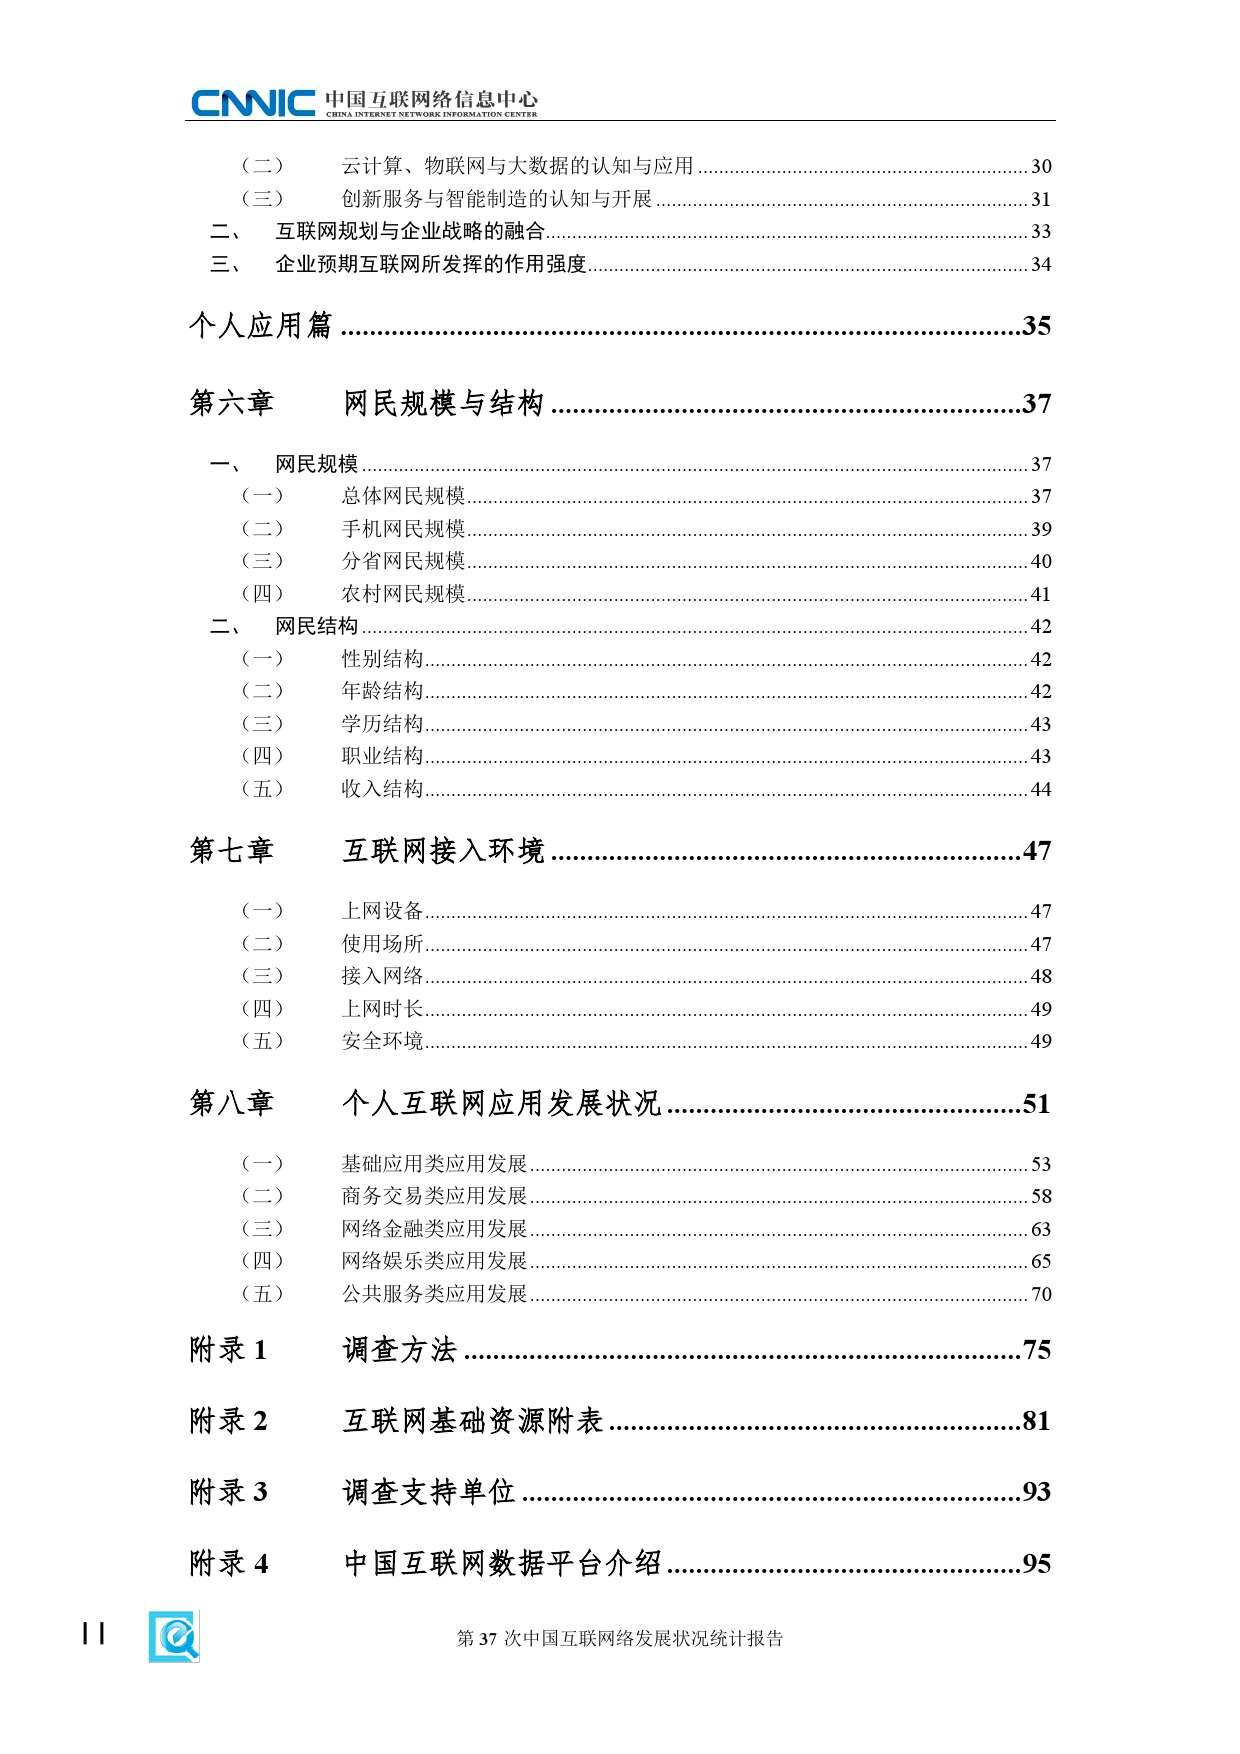 CNNIC:2015年第37次中国互联网络发展状况统计报告_000006